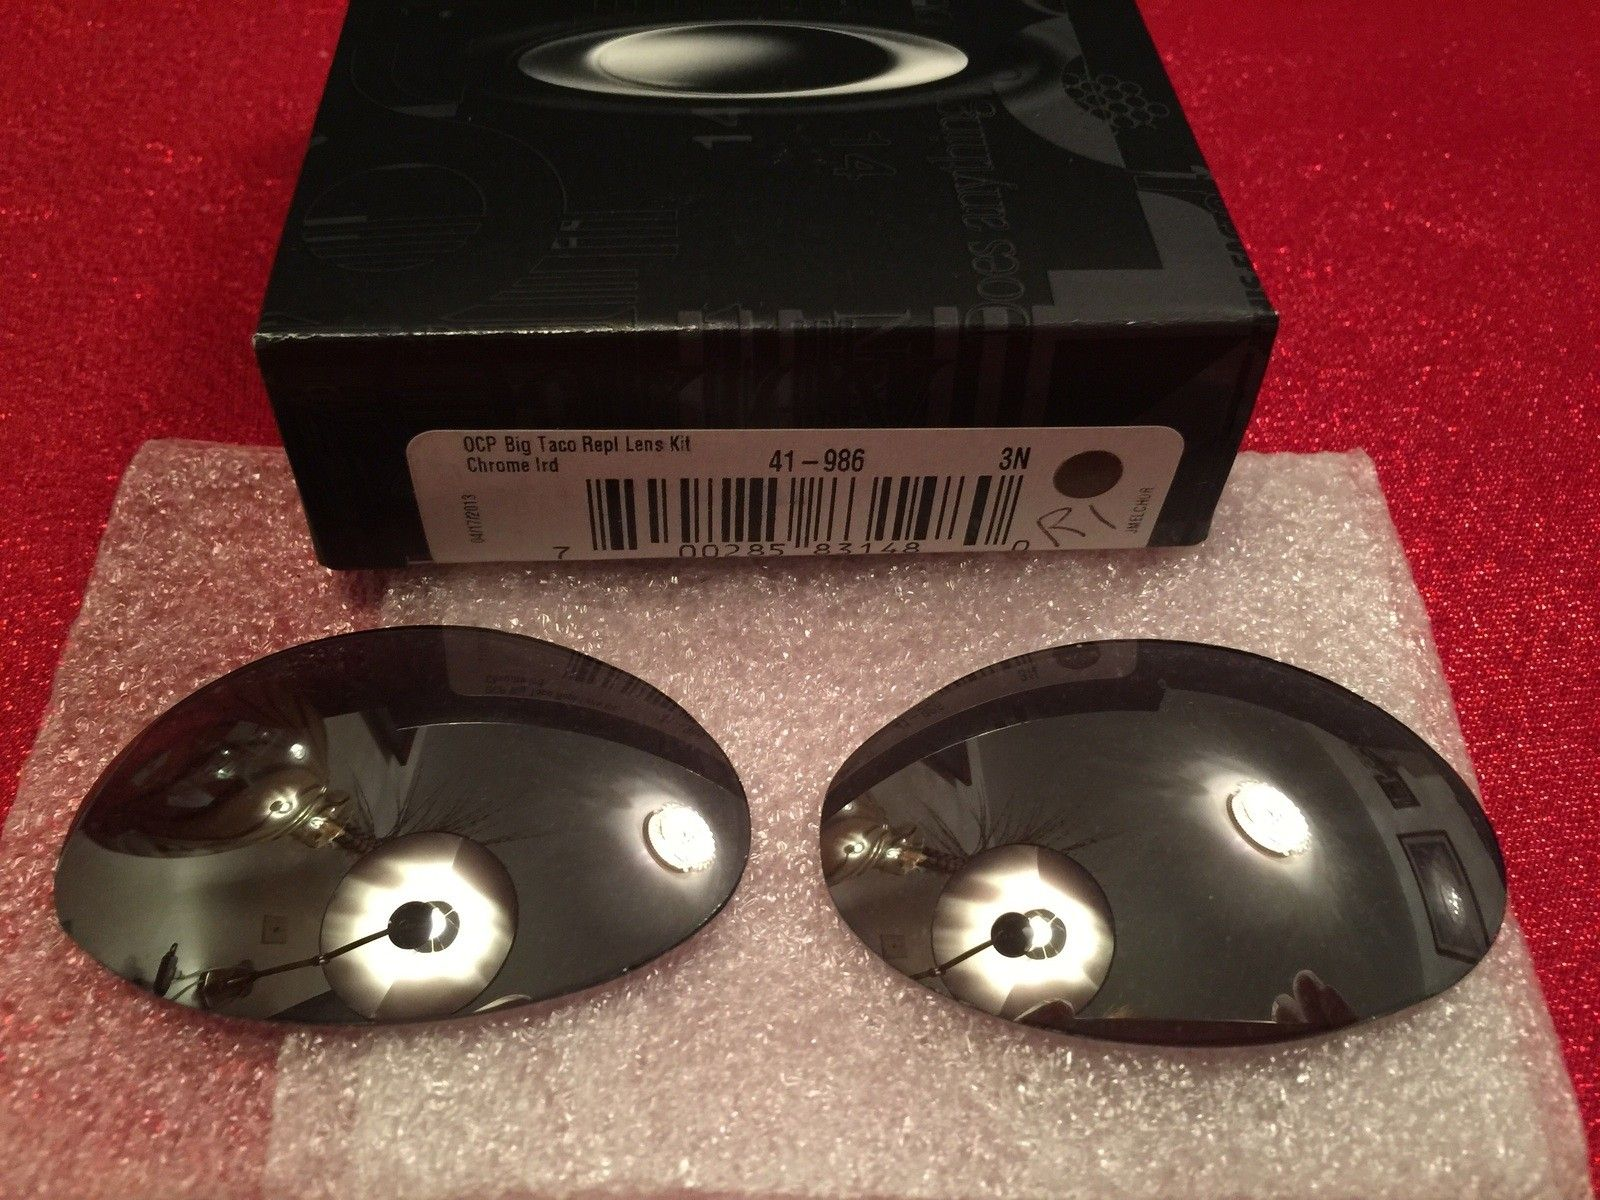 Romeo 1 lens and Linegear Black Rubber kit - image.jpg